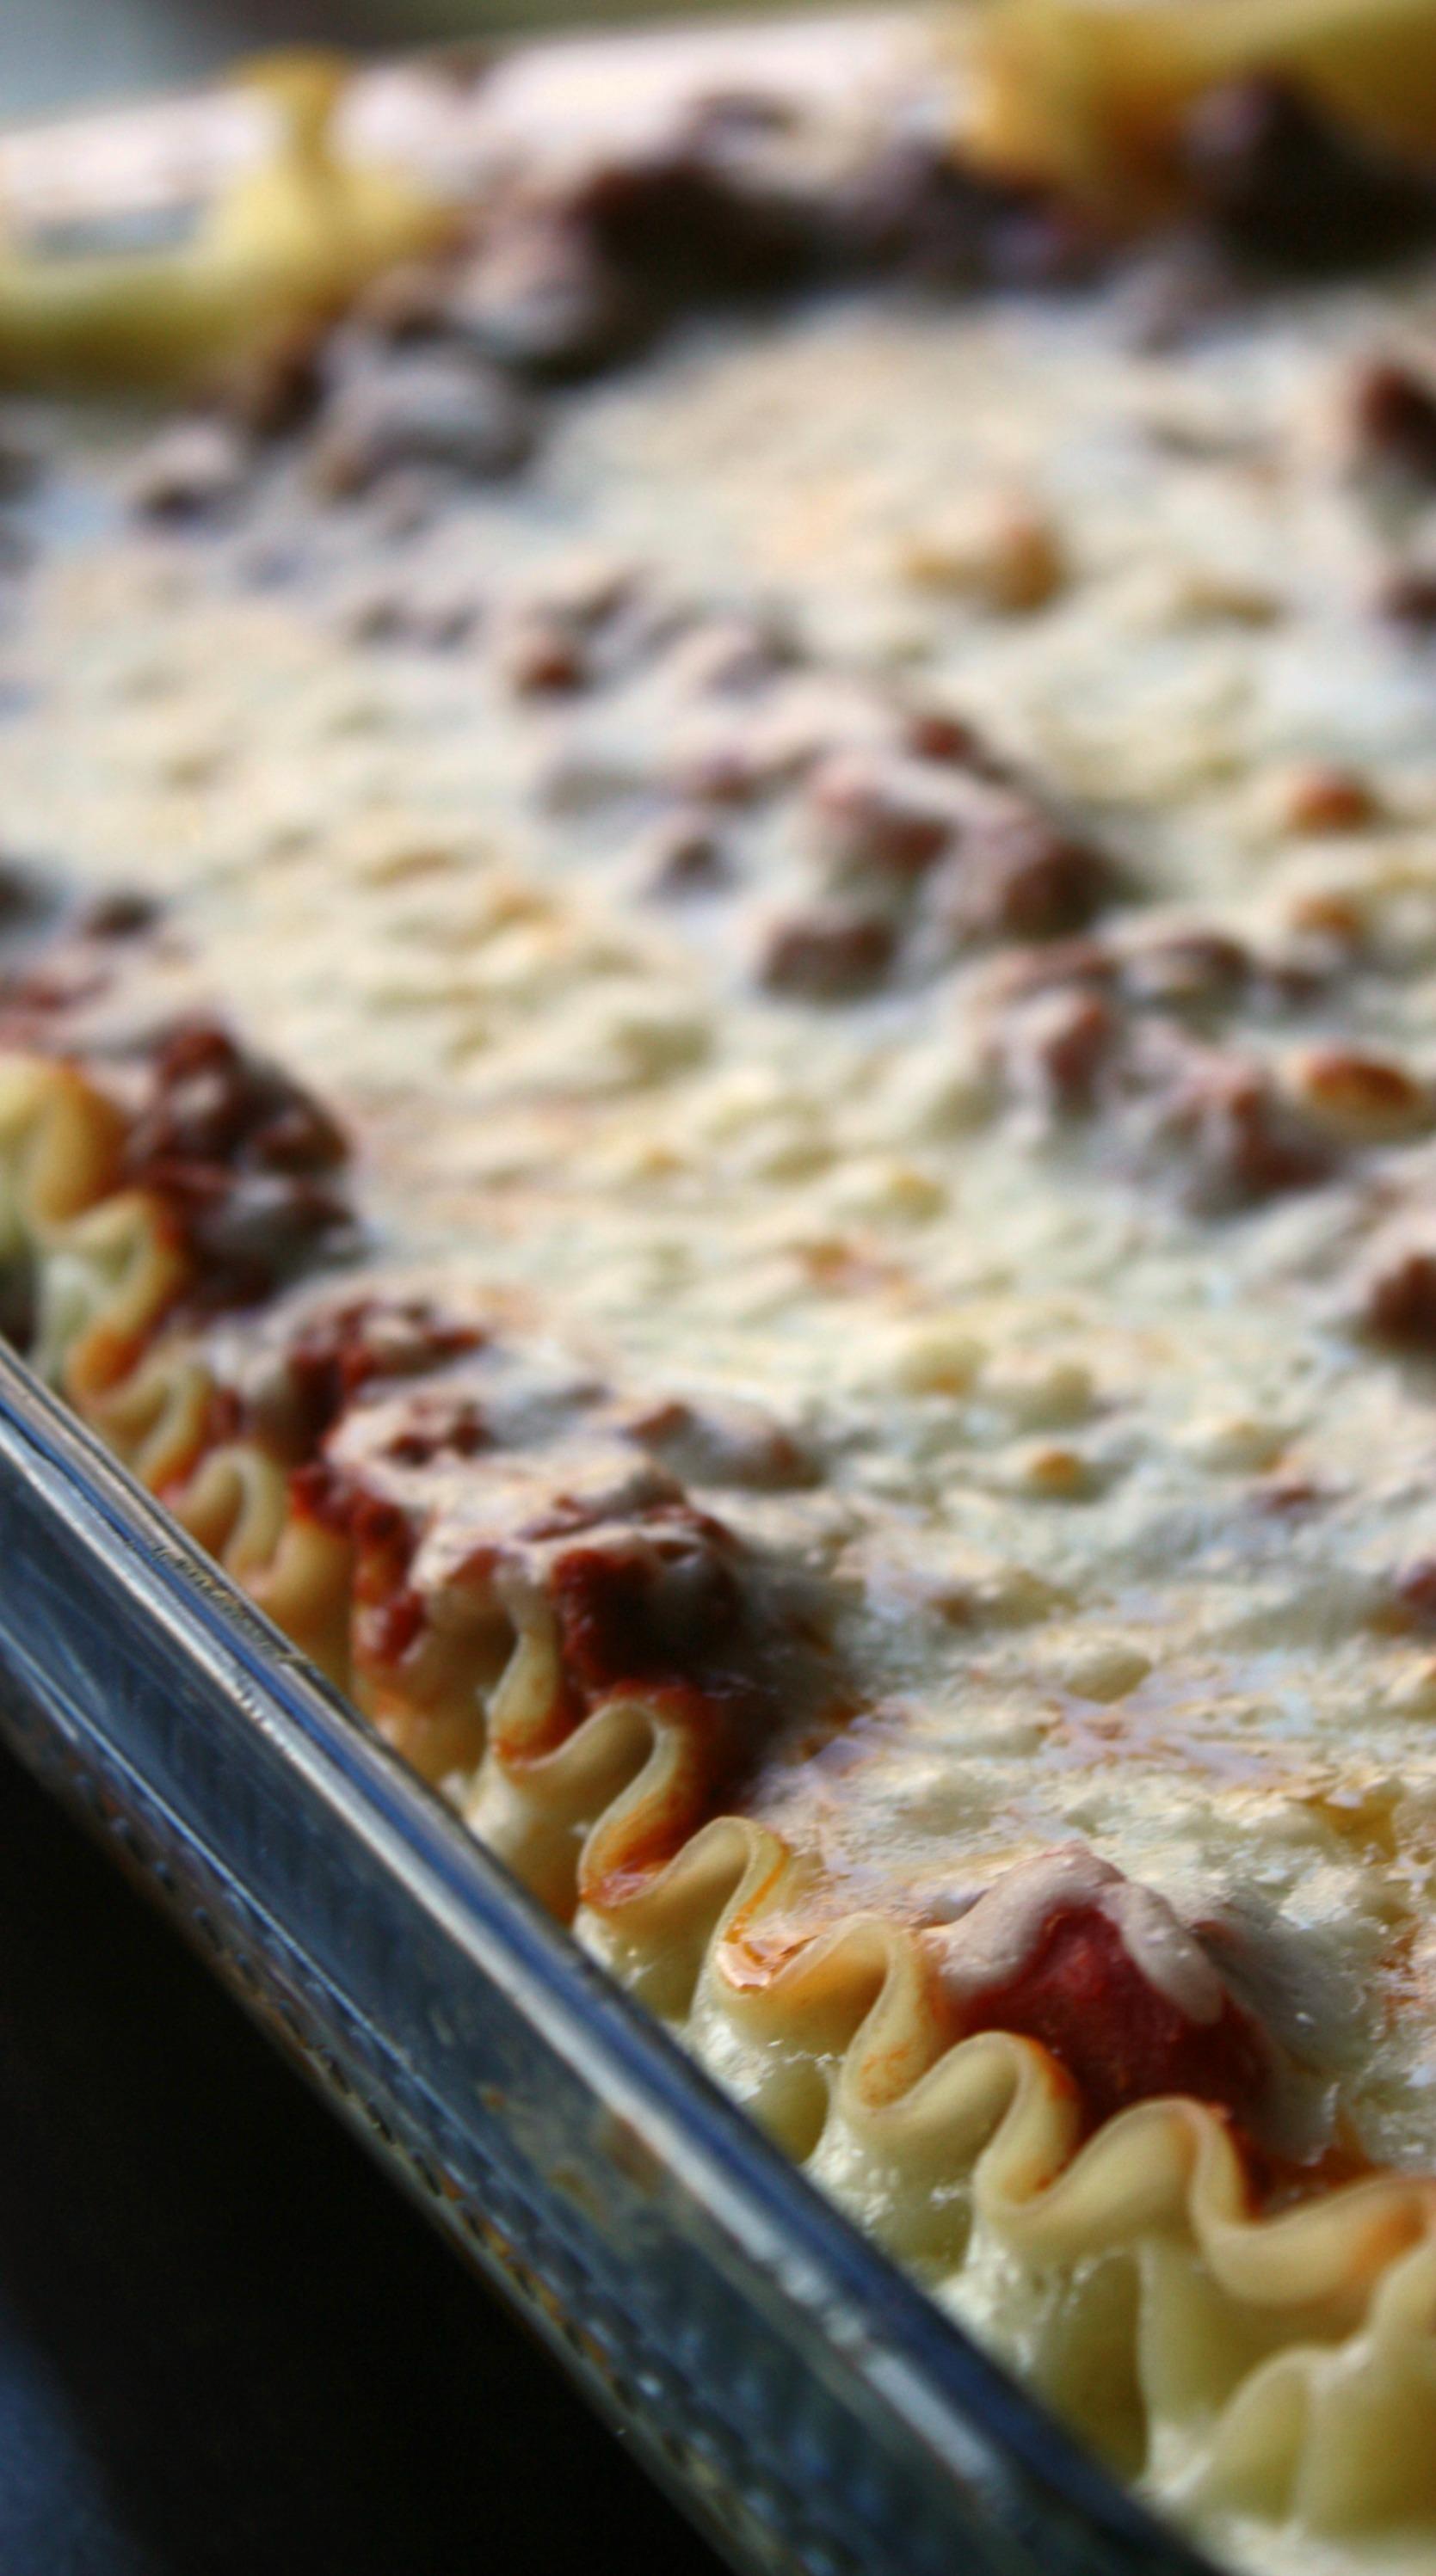 Basic Lasagna recipe with ground beef.